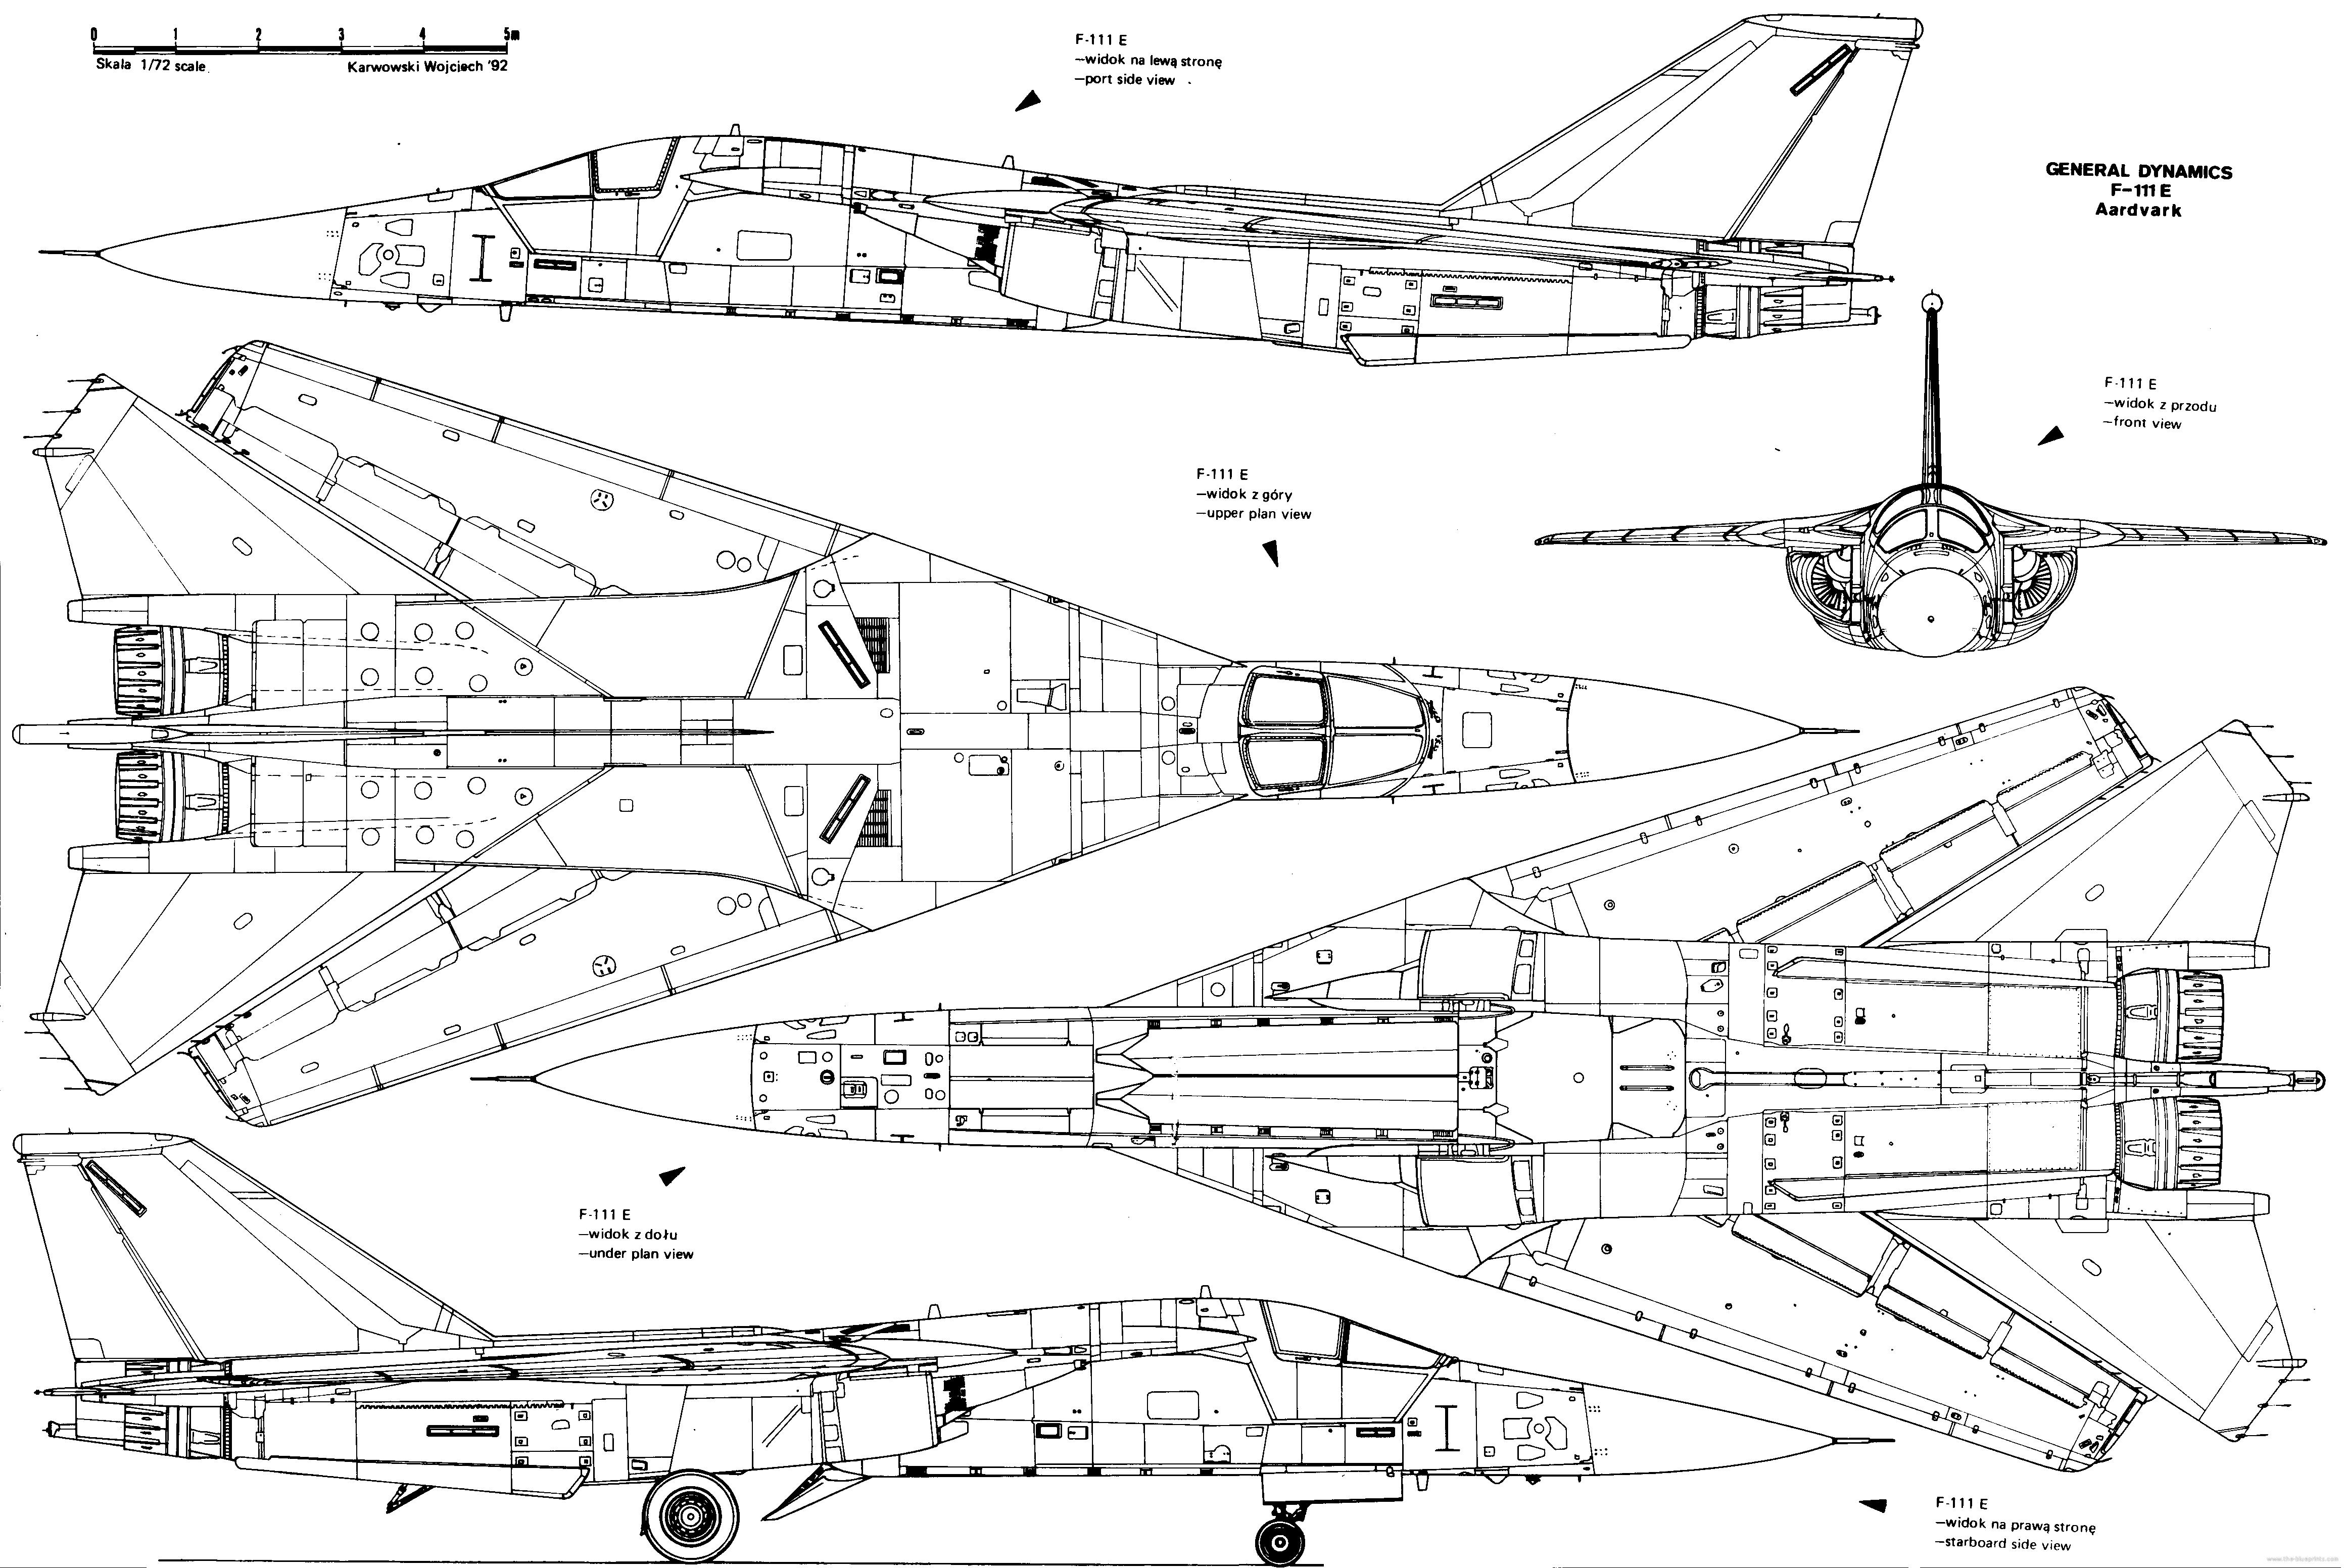 general-dynamics-f-111-3.png